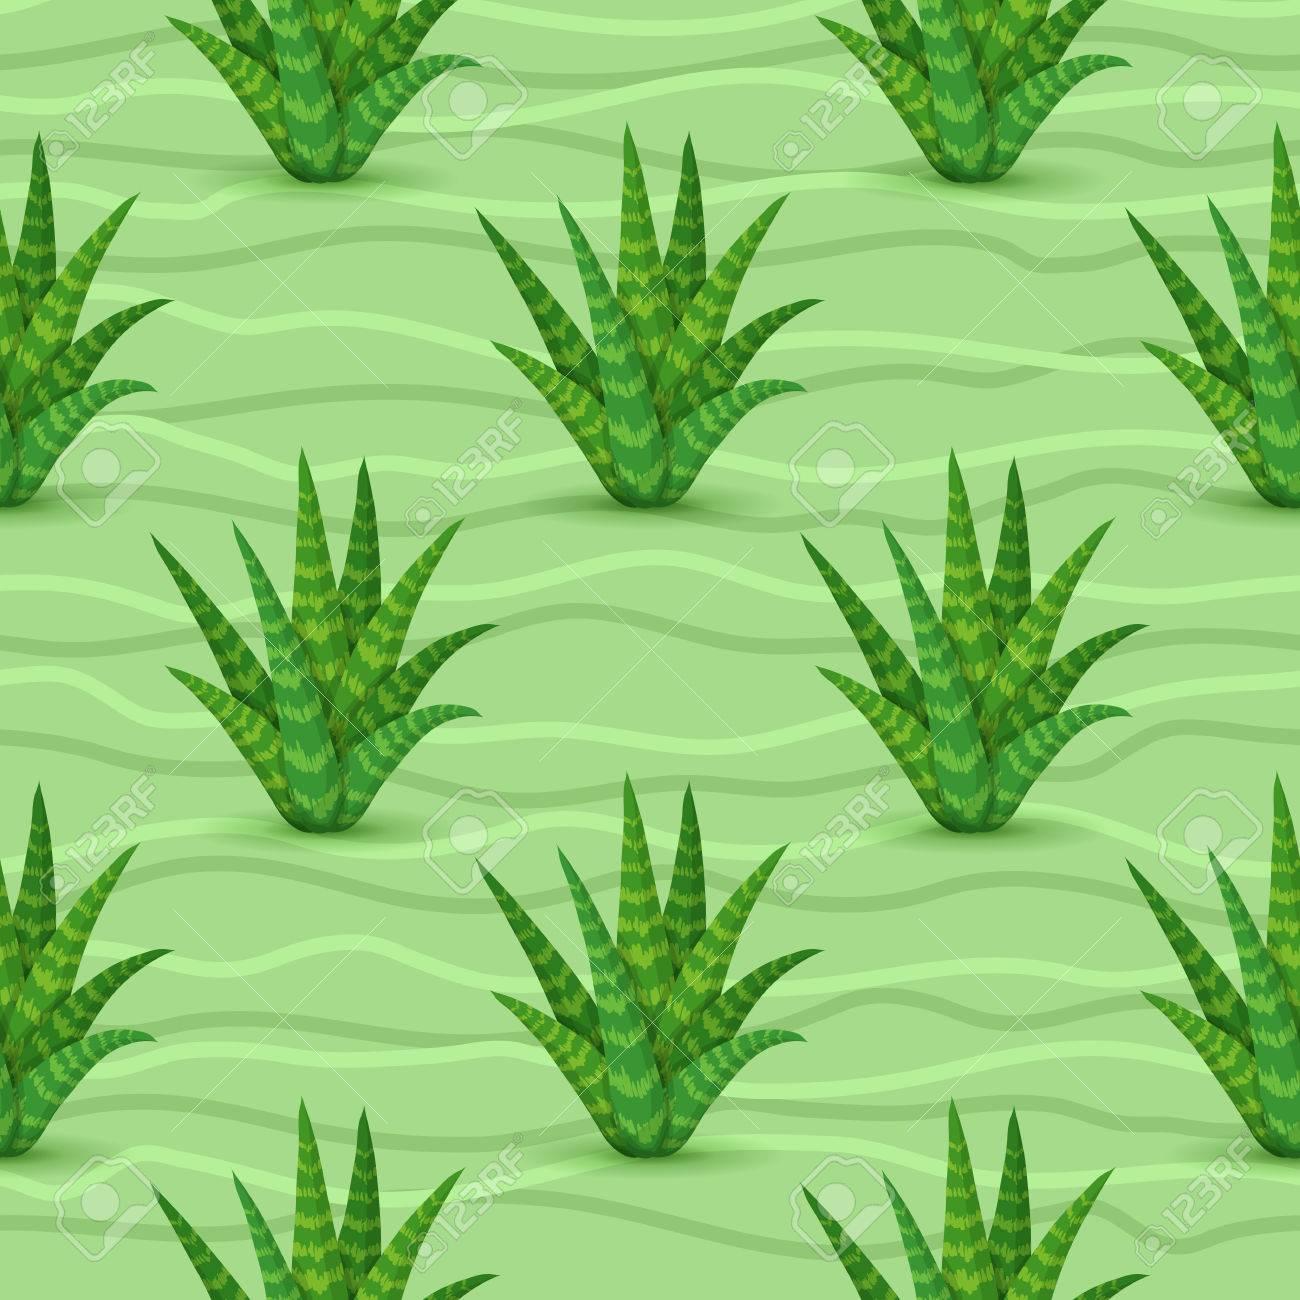 Succulents Seamless Pattern Vector Illustration With Aloe Vera